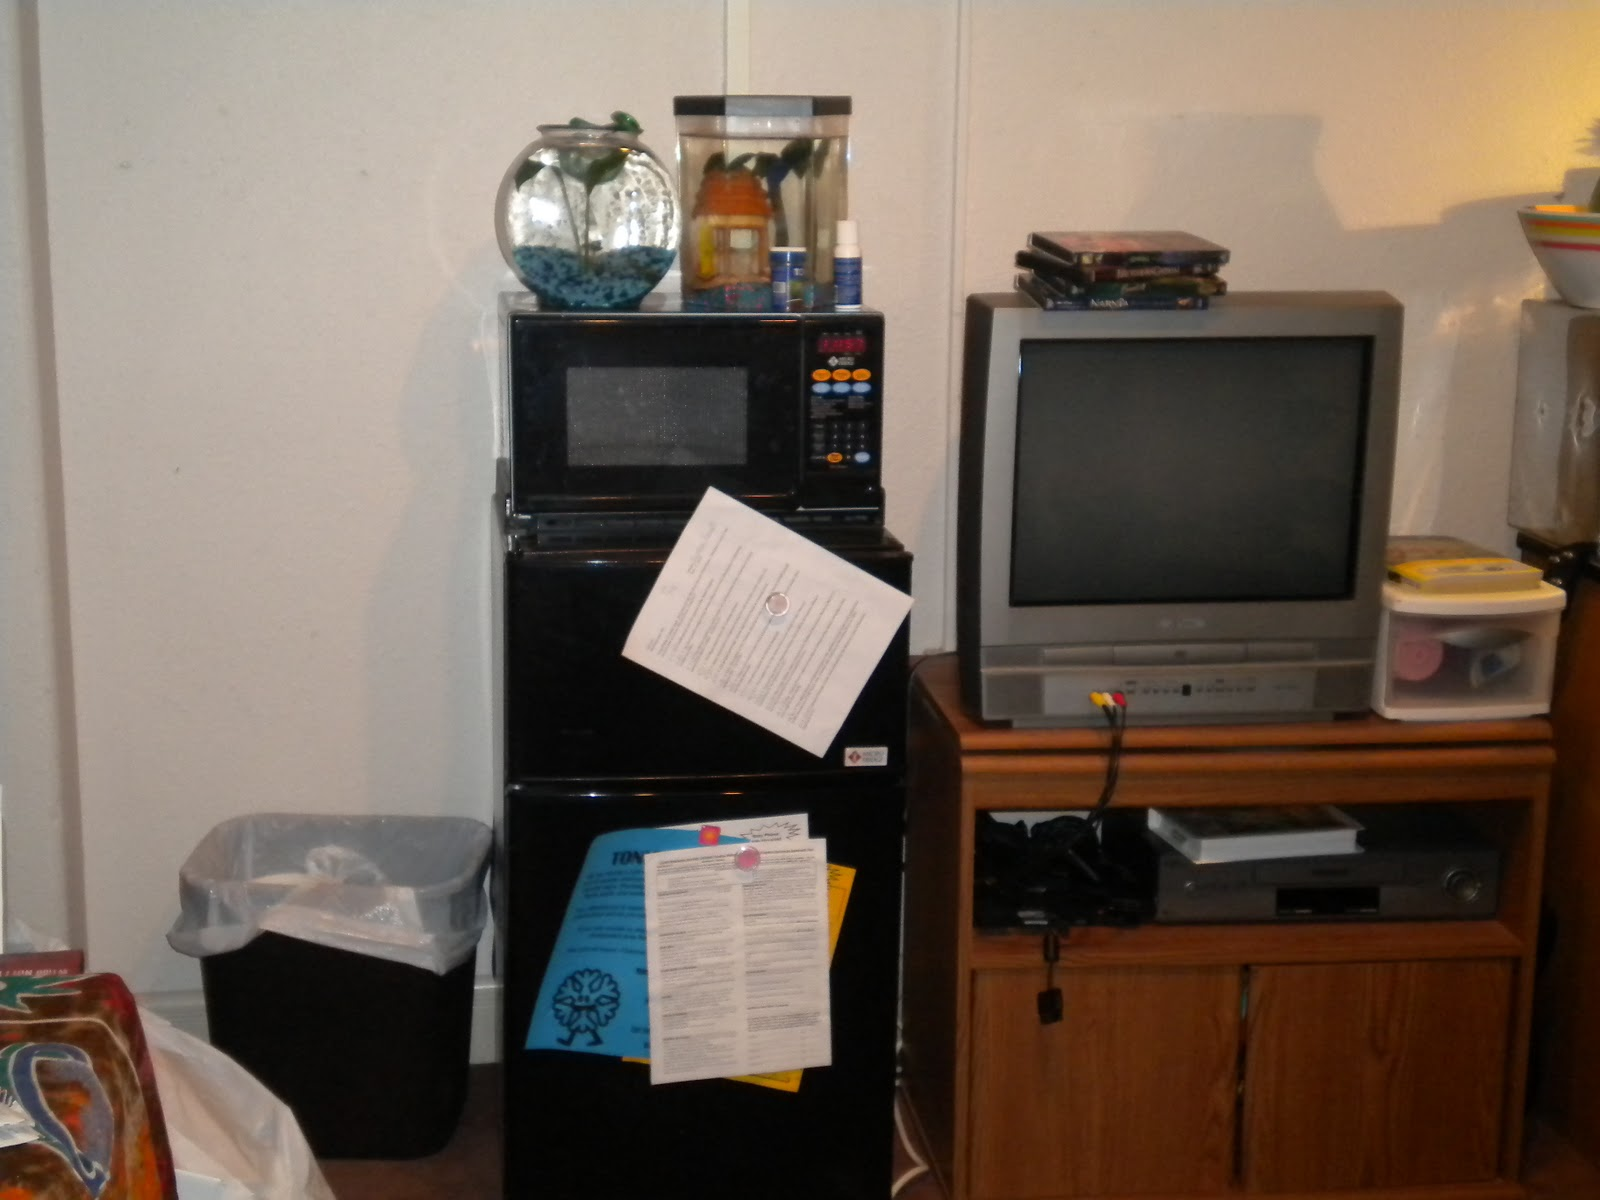 College Life New Dorm Room Set Up